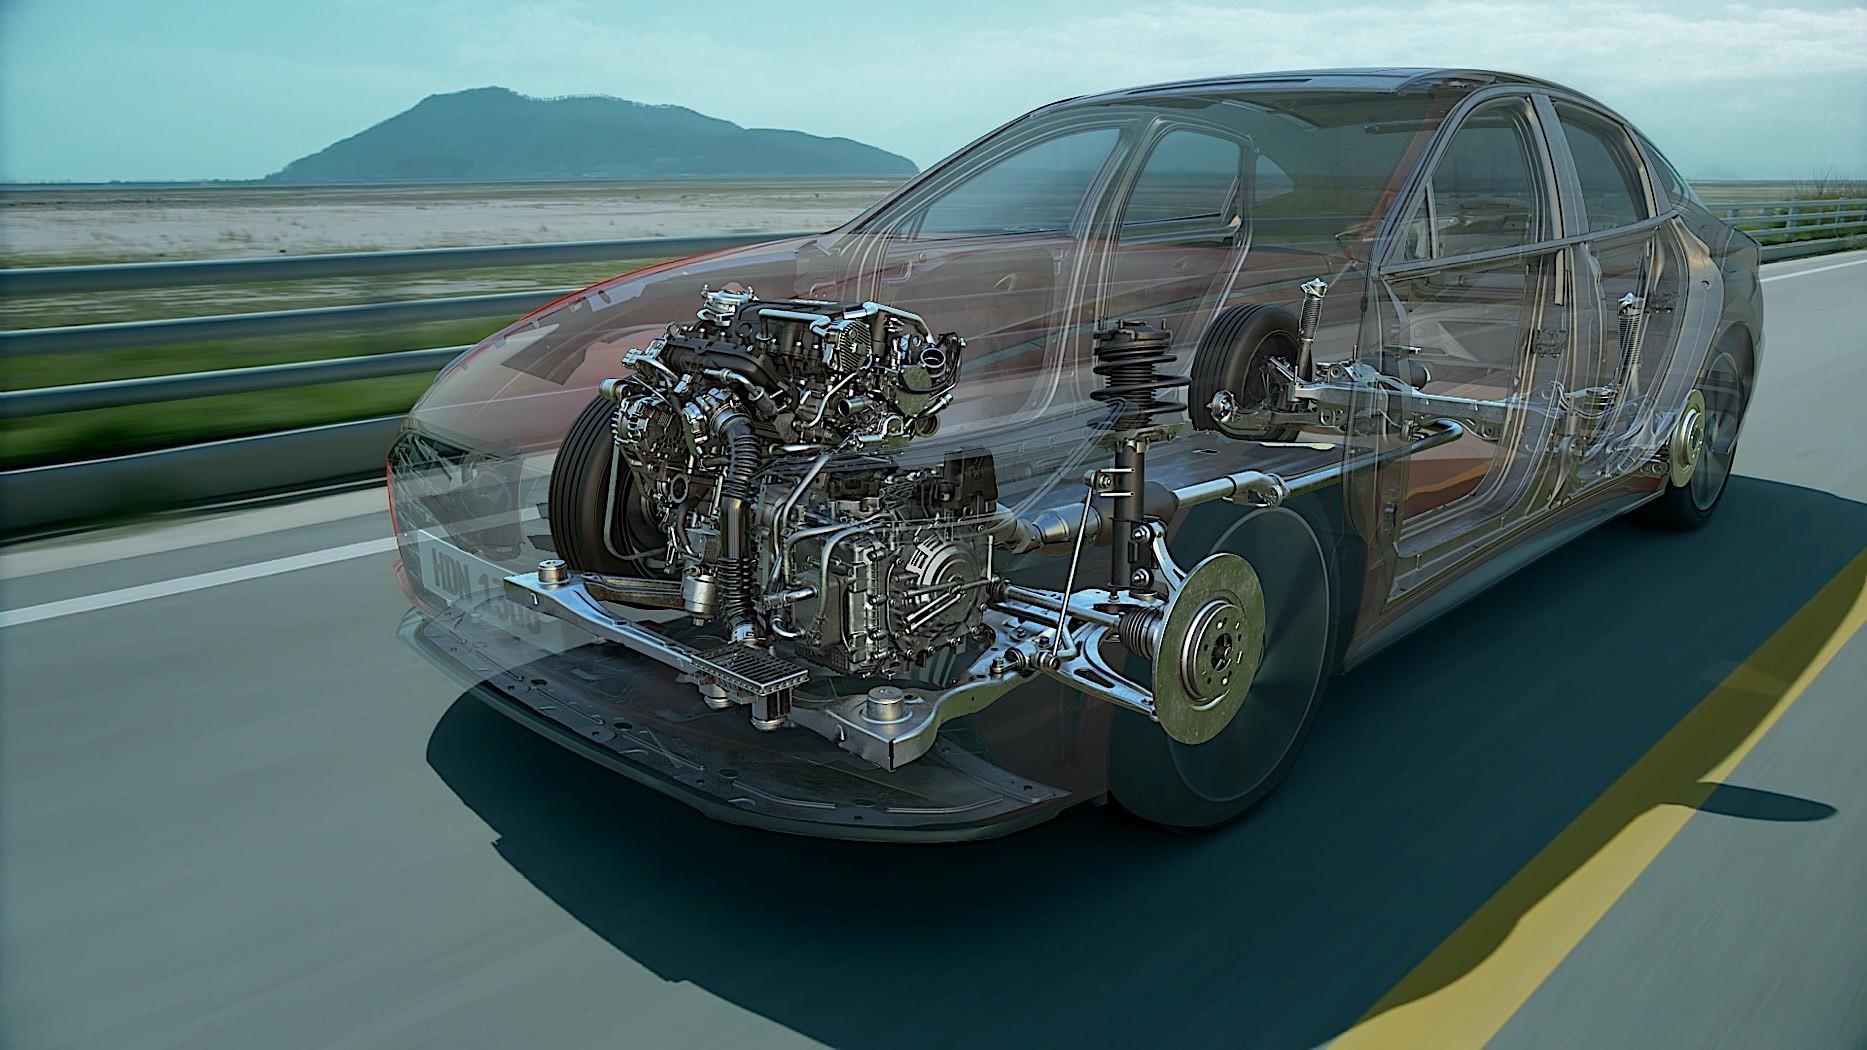 new-smartstream-cvvd-engine-tech-to-power-hyundai-and-kia-cars_2.jpg